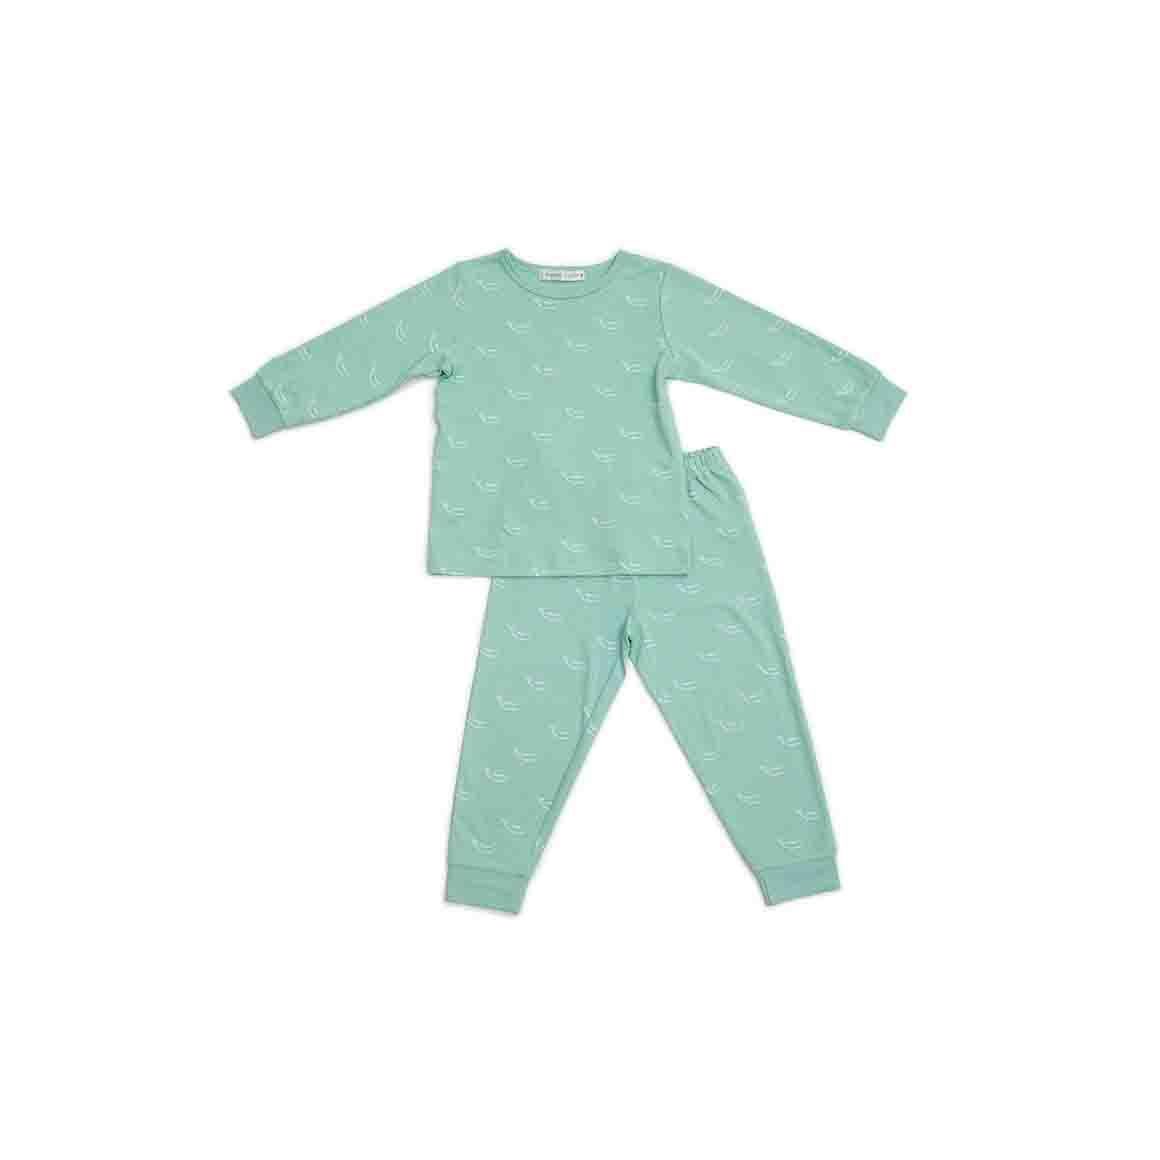 Autumn/Winter Childrens Pyjama Set - Sage Green in Tiny Whales Print   Trada Marketplace